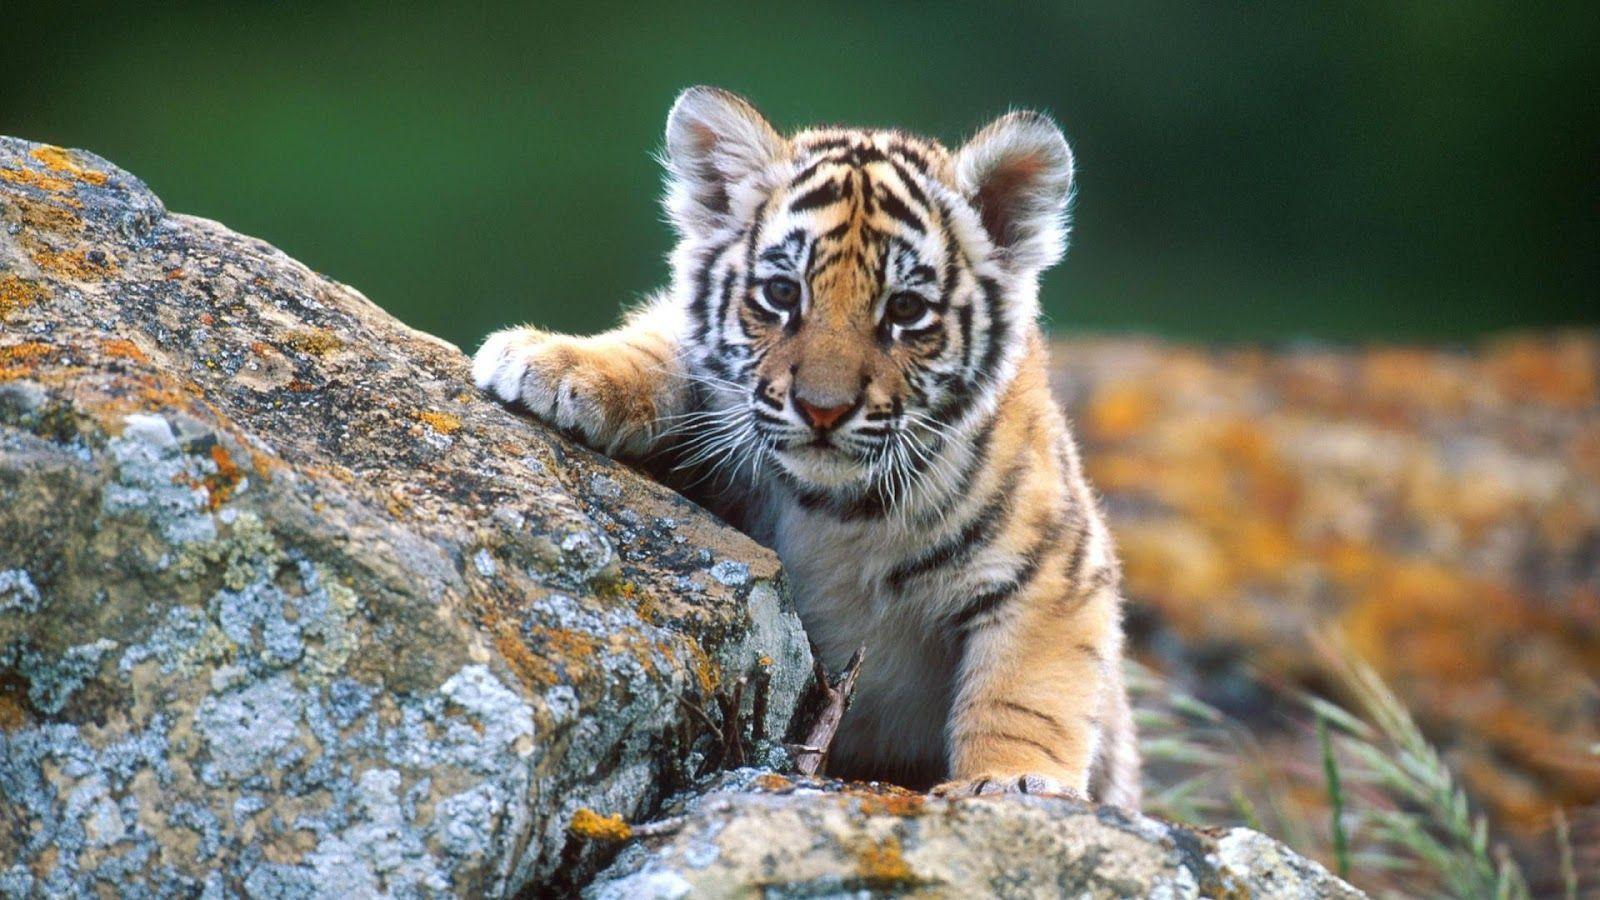 Cute Wild Animals Wallpapers   Top Cute Wild Animals 1600x900